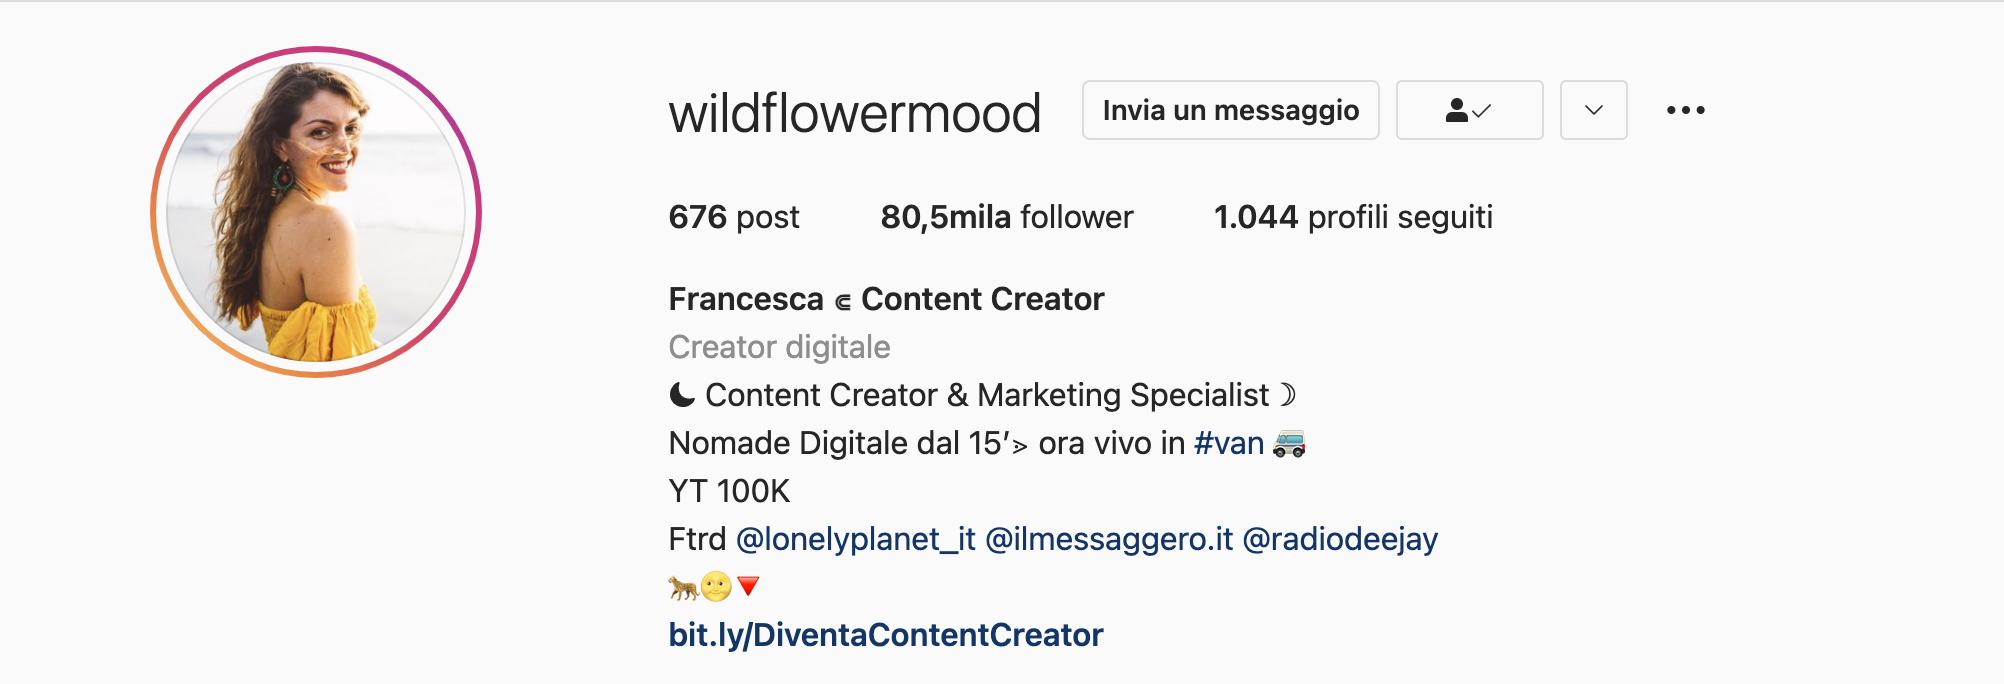 Bio Instagram Wildflowermood - Francesca Ruvolo